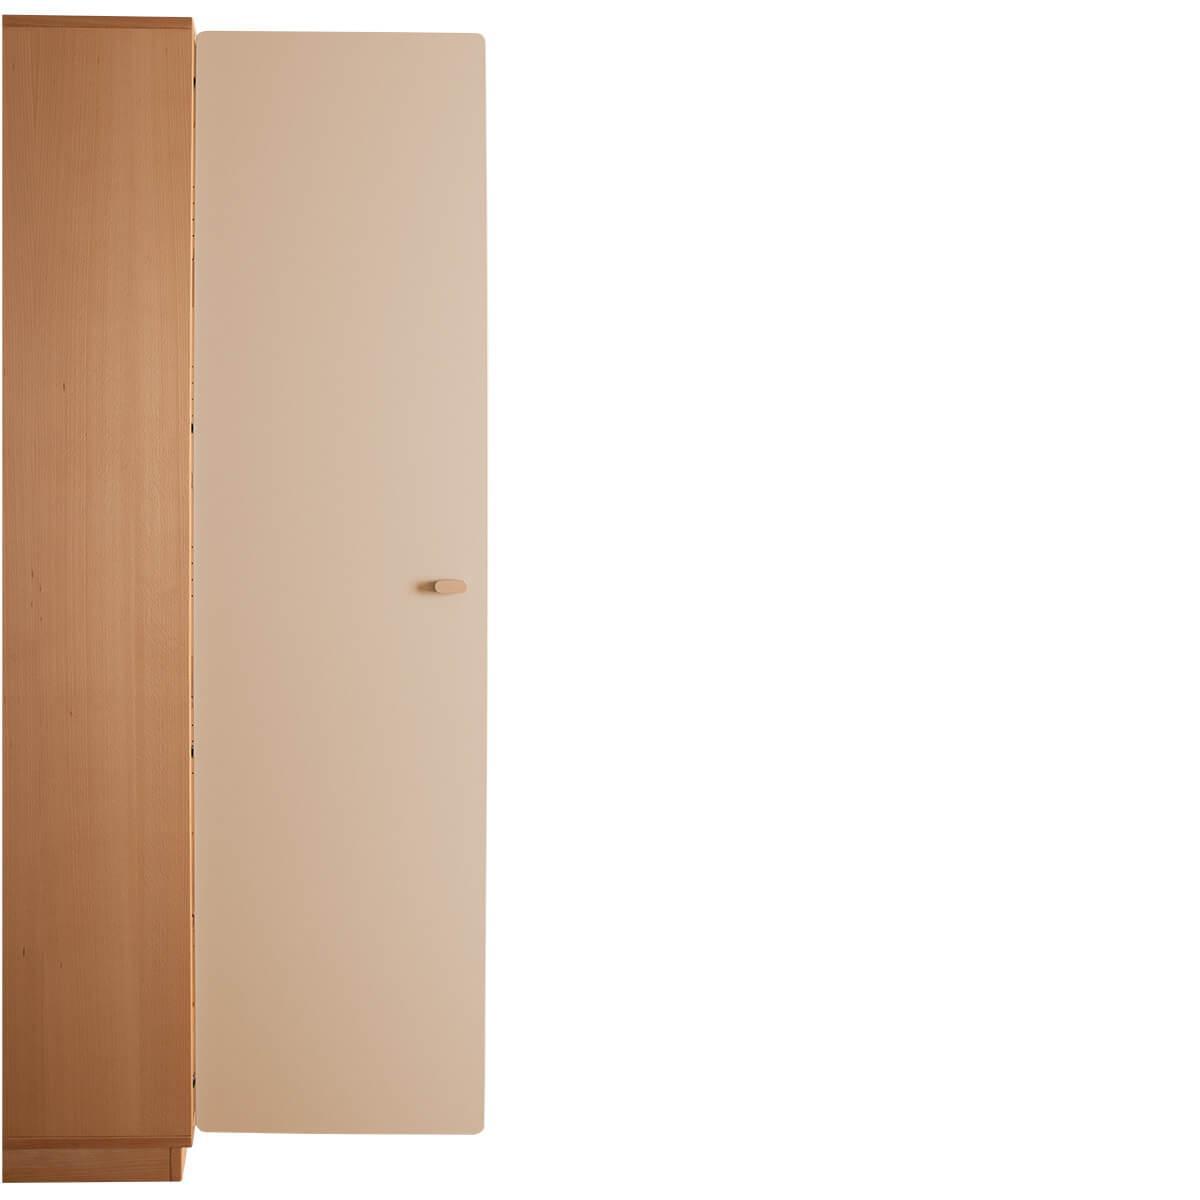 Schranktür 5/5 176cm-Griff DESTYLE de Breuyn MDF hellgrau-lackiert